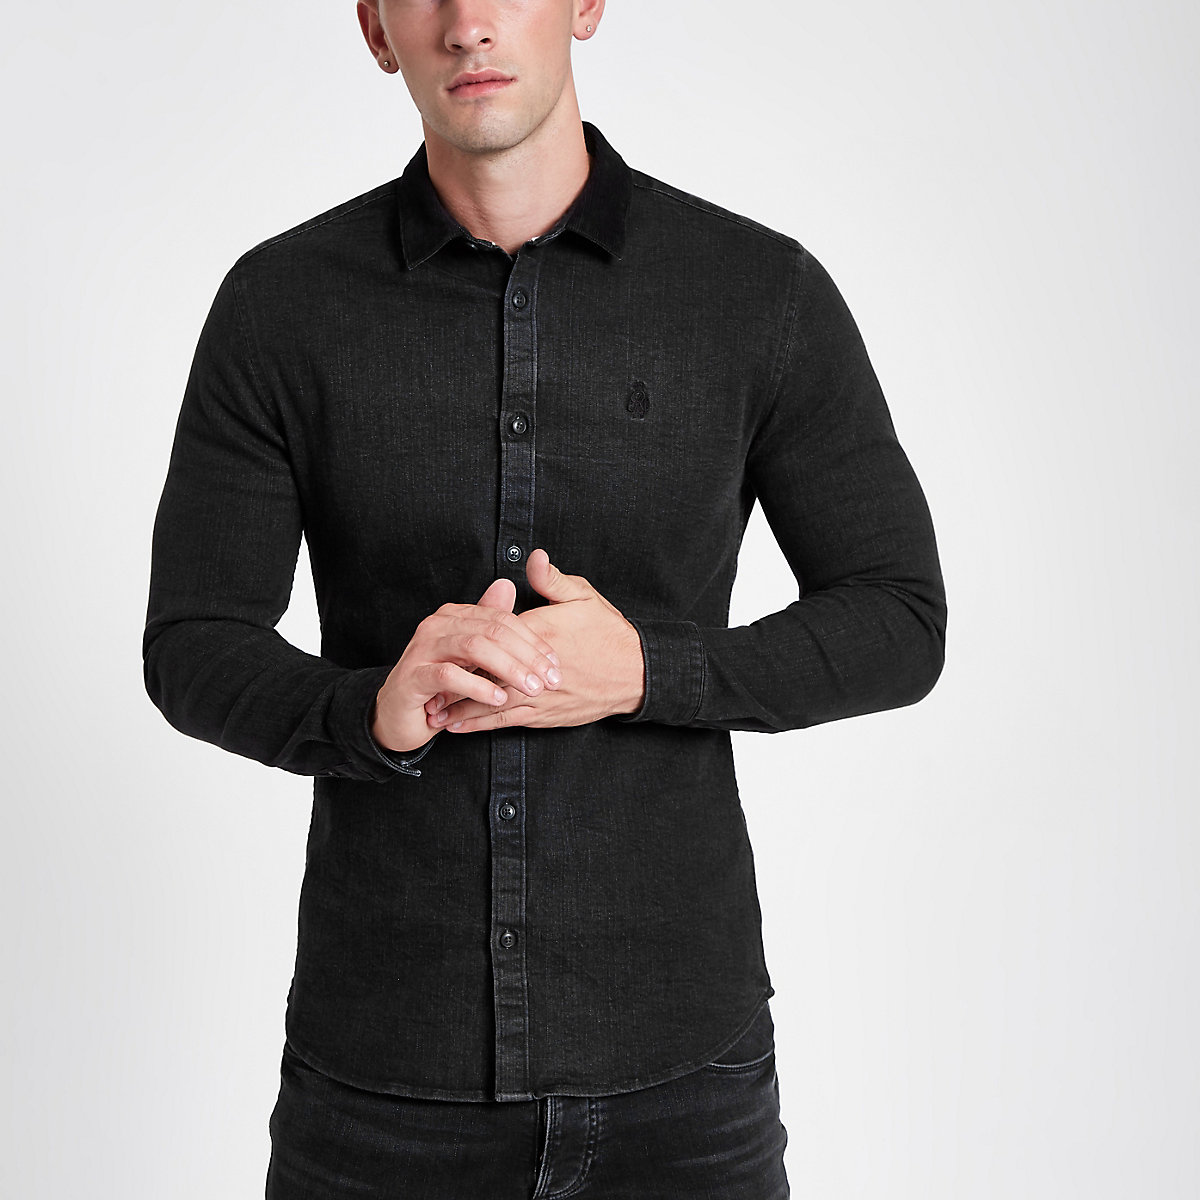 Black long sleeve button-down denim shirt